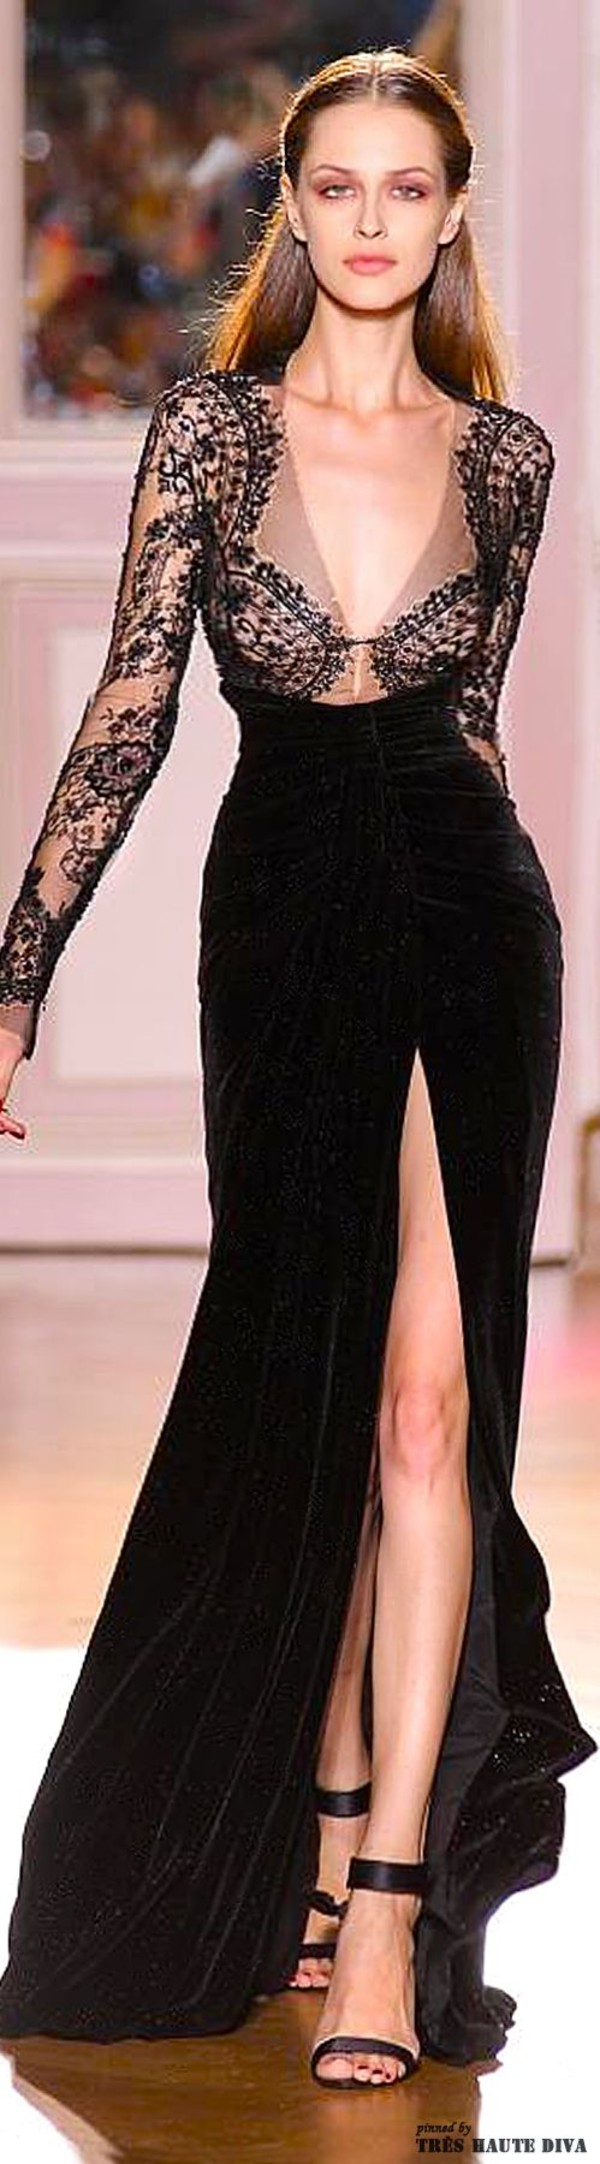 black dress gown